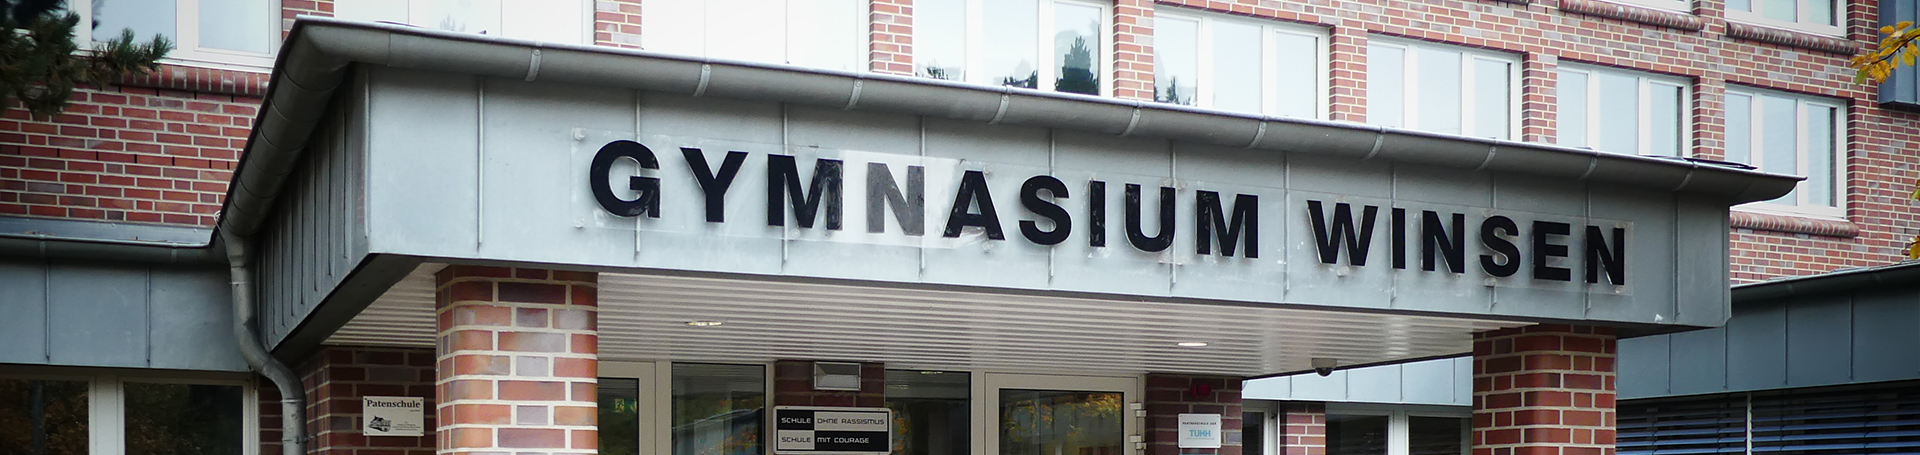 schuleingang_gymnasium_winsen_